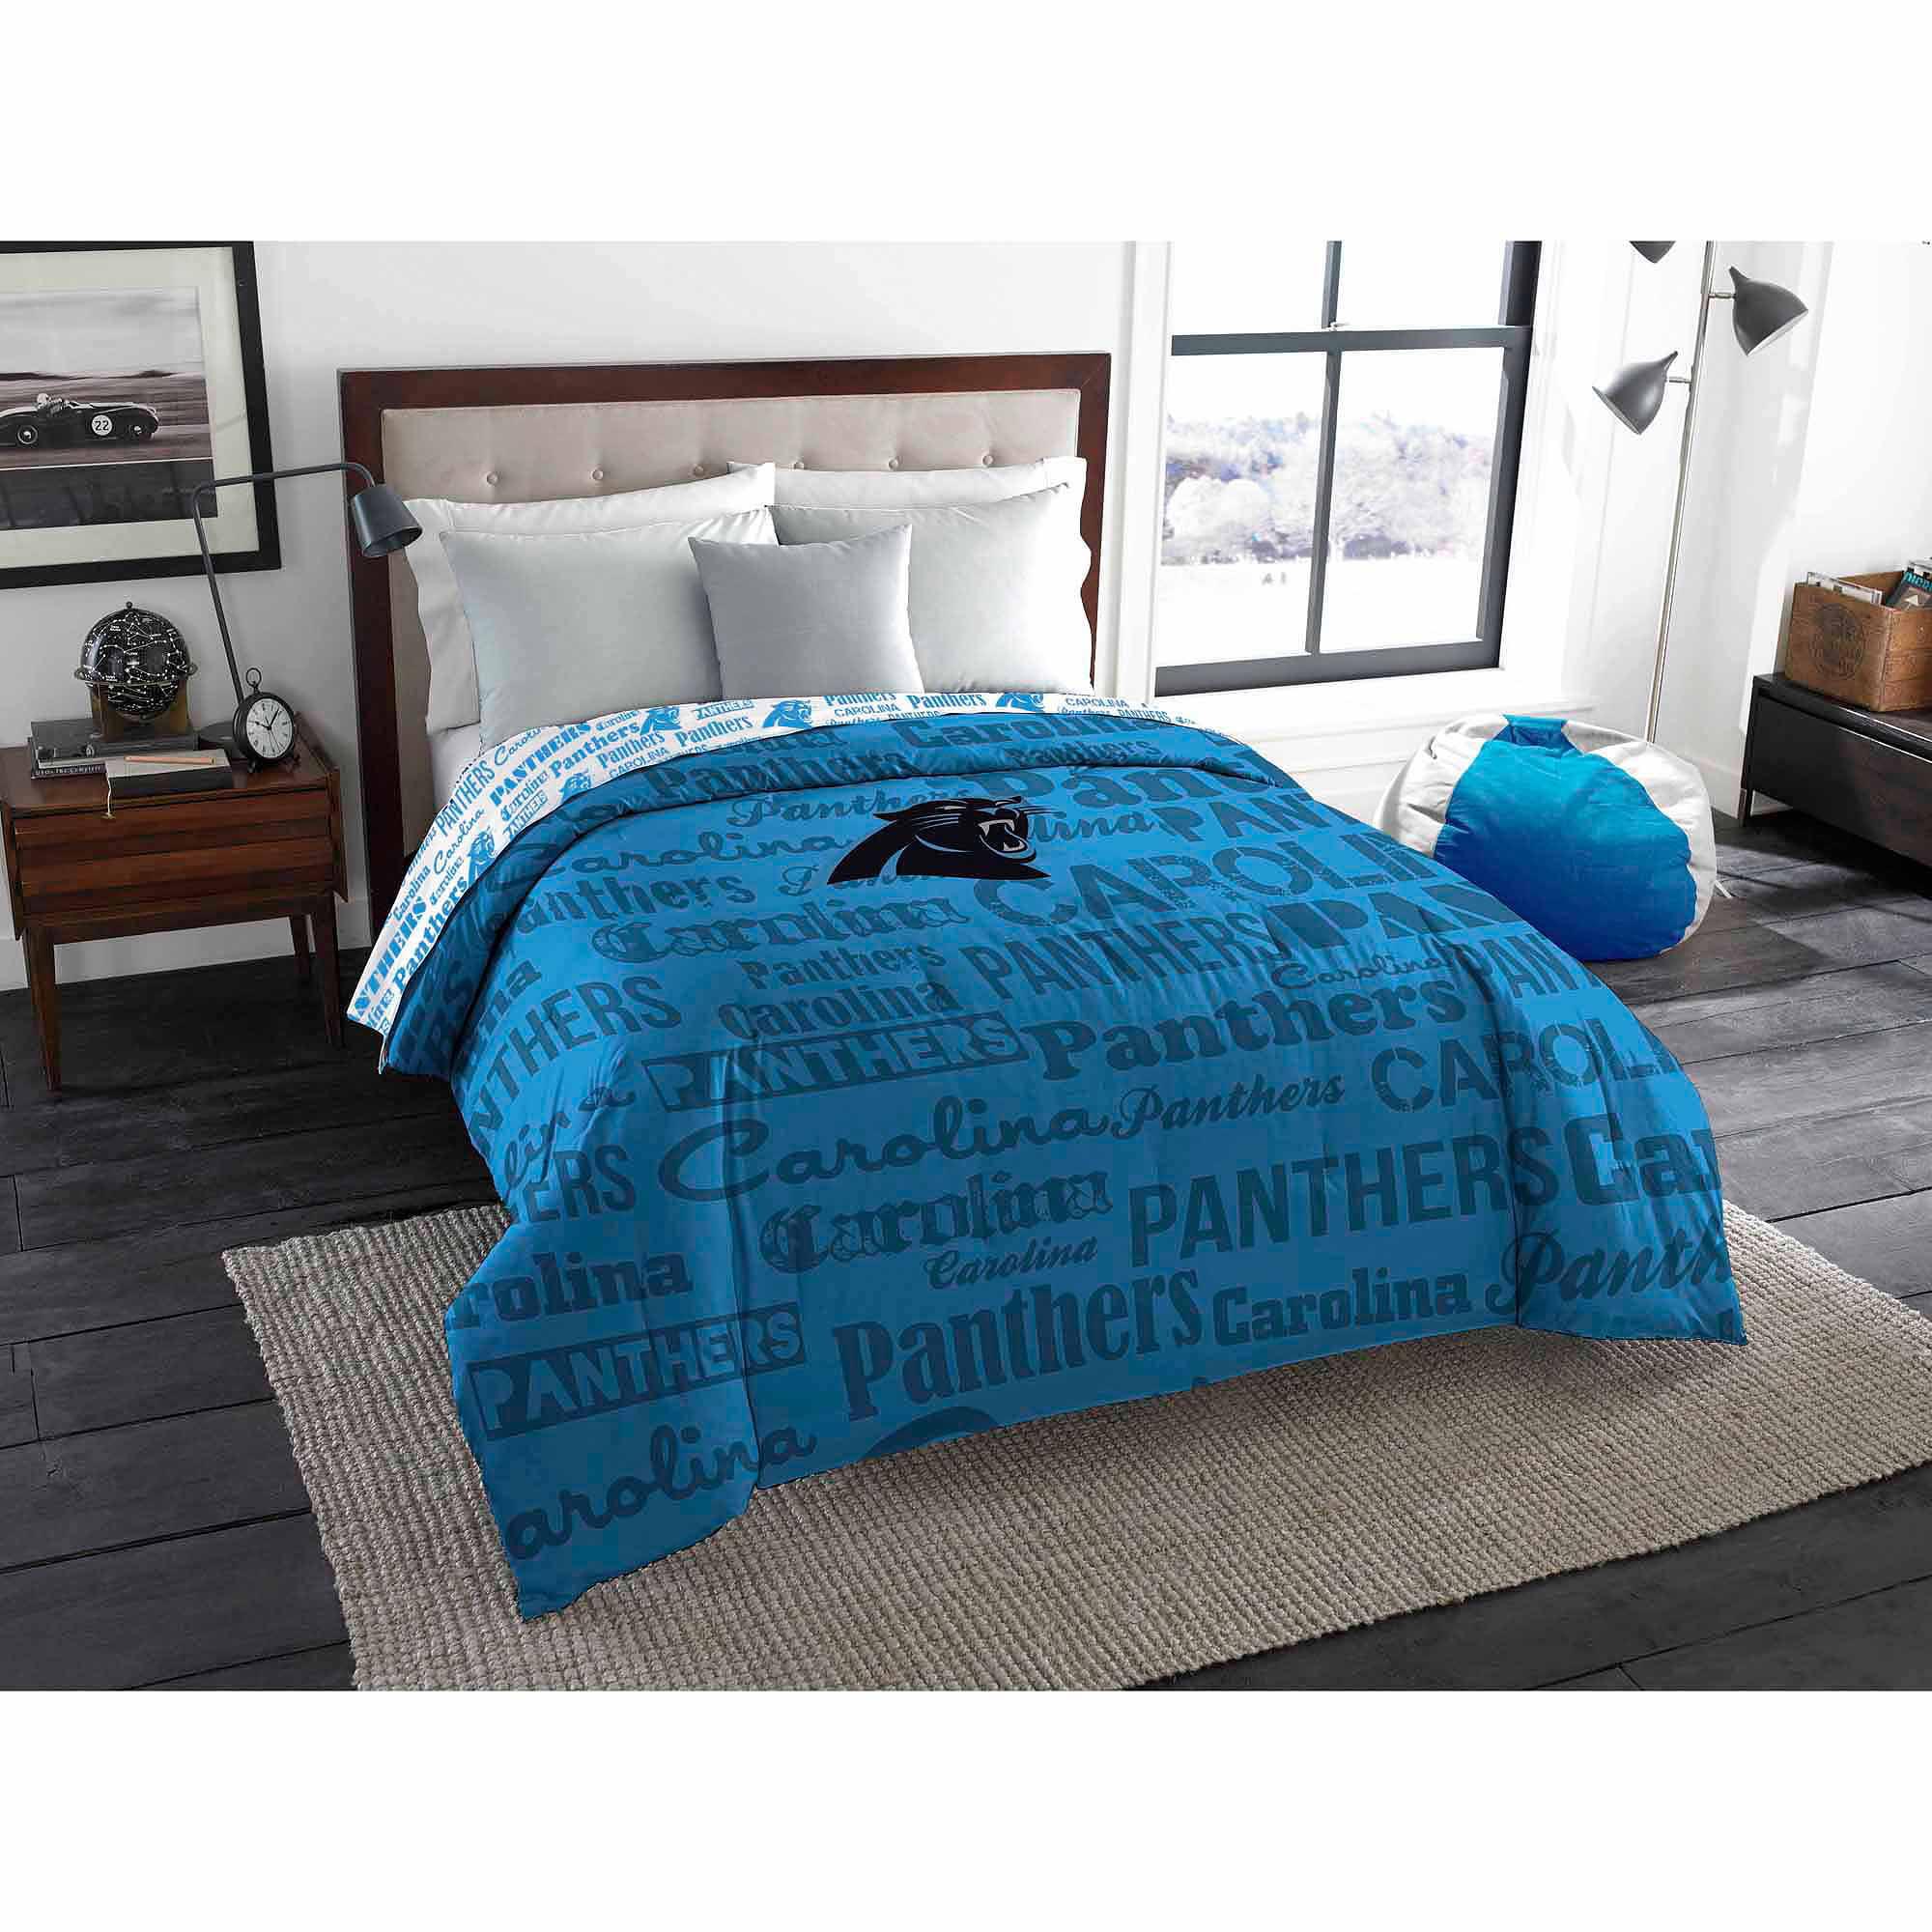 Marvelous NFL Carolina Panthers Twin/Full Bedding Comforter   Walmart.com